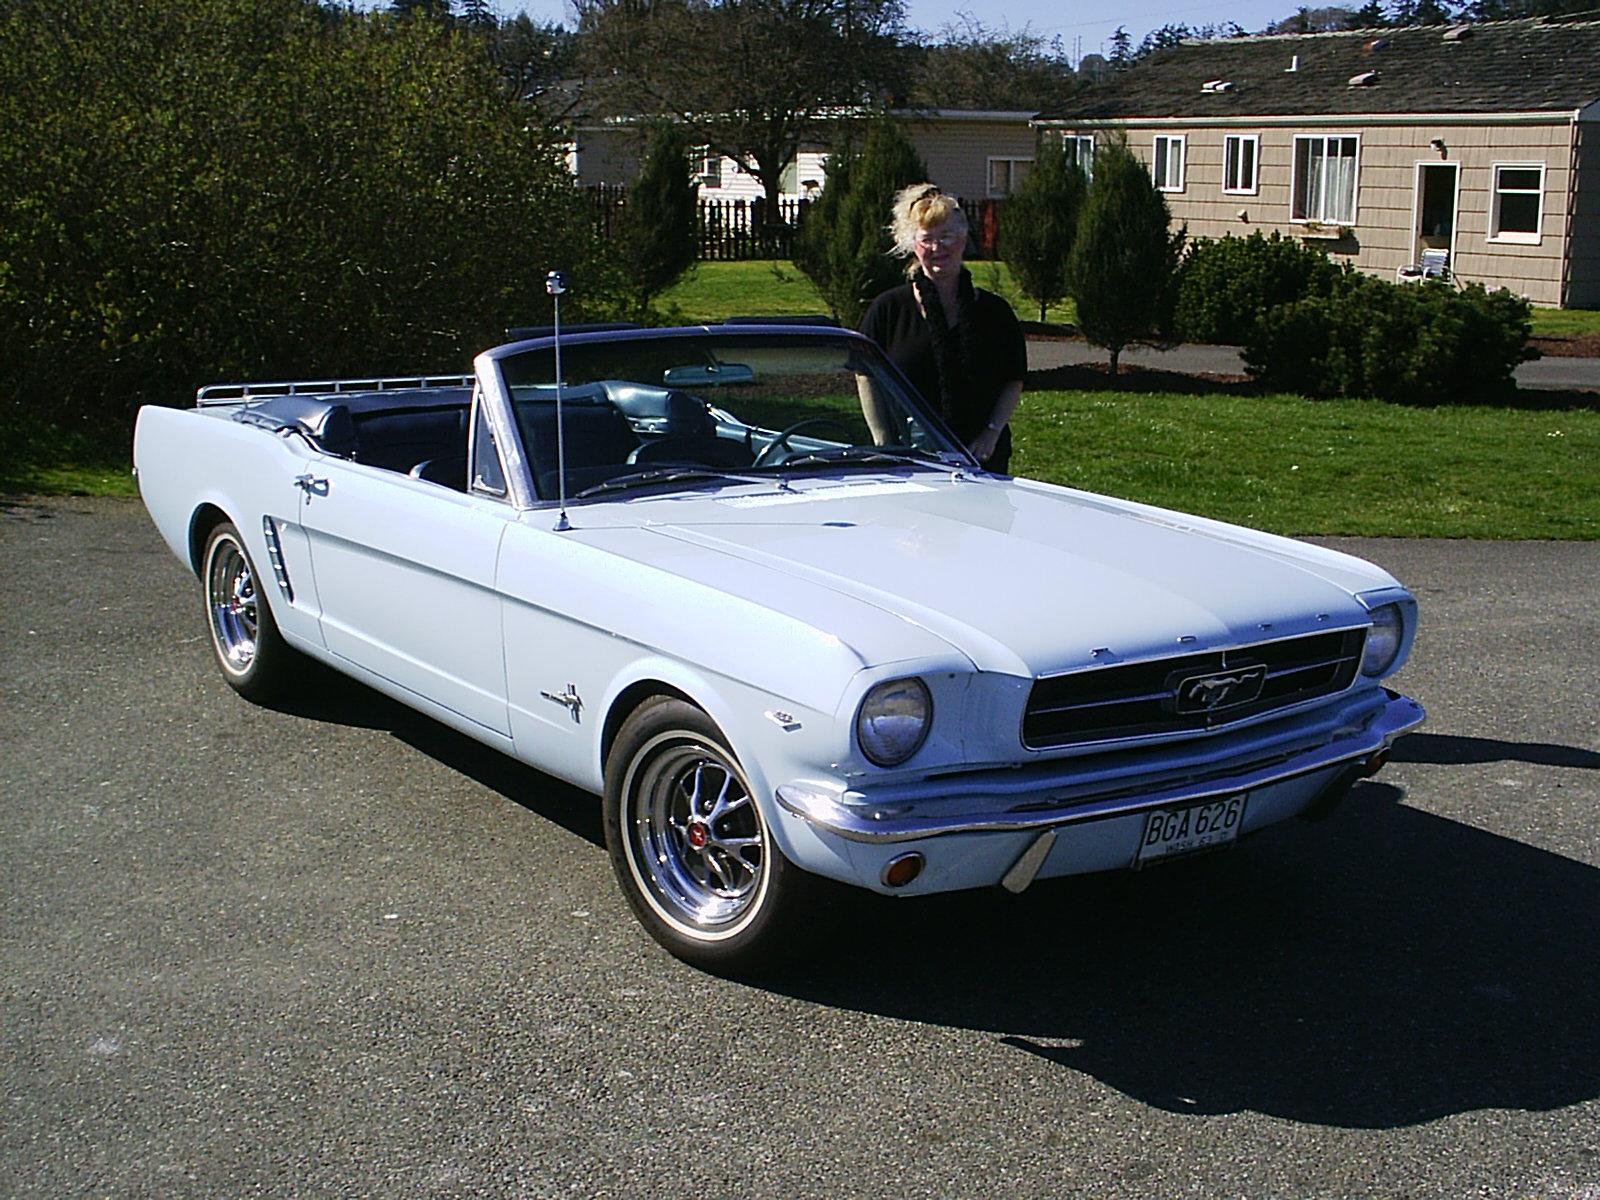 Bud & Brenda Axley 1965 Ford Mustang